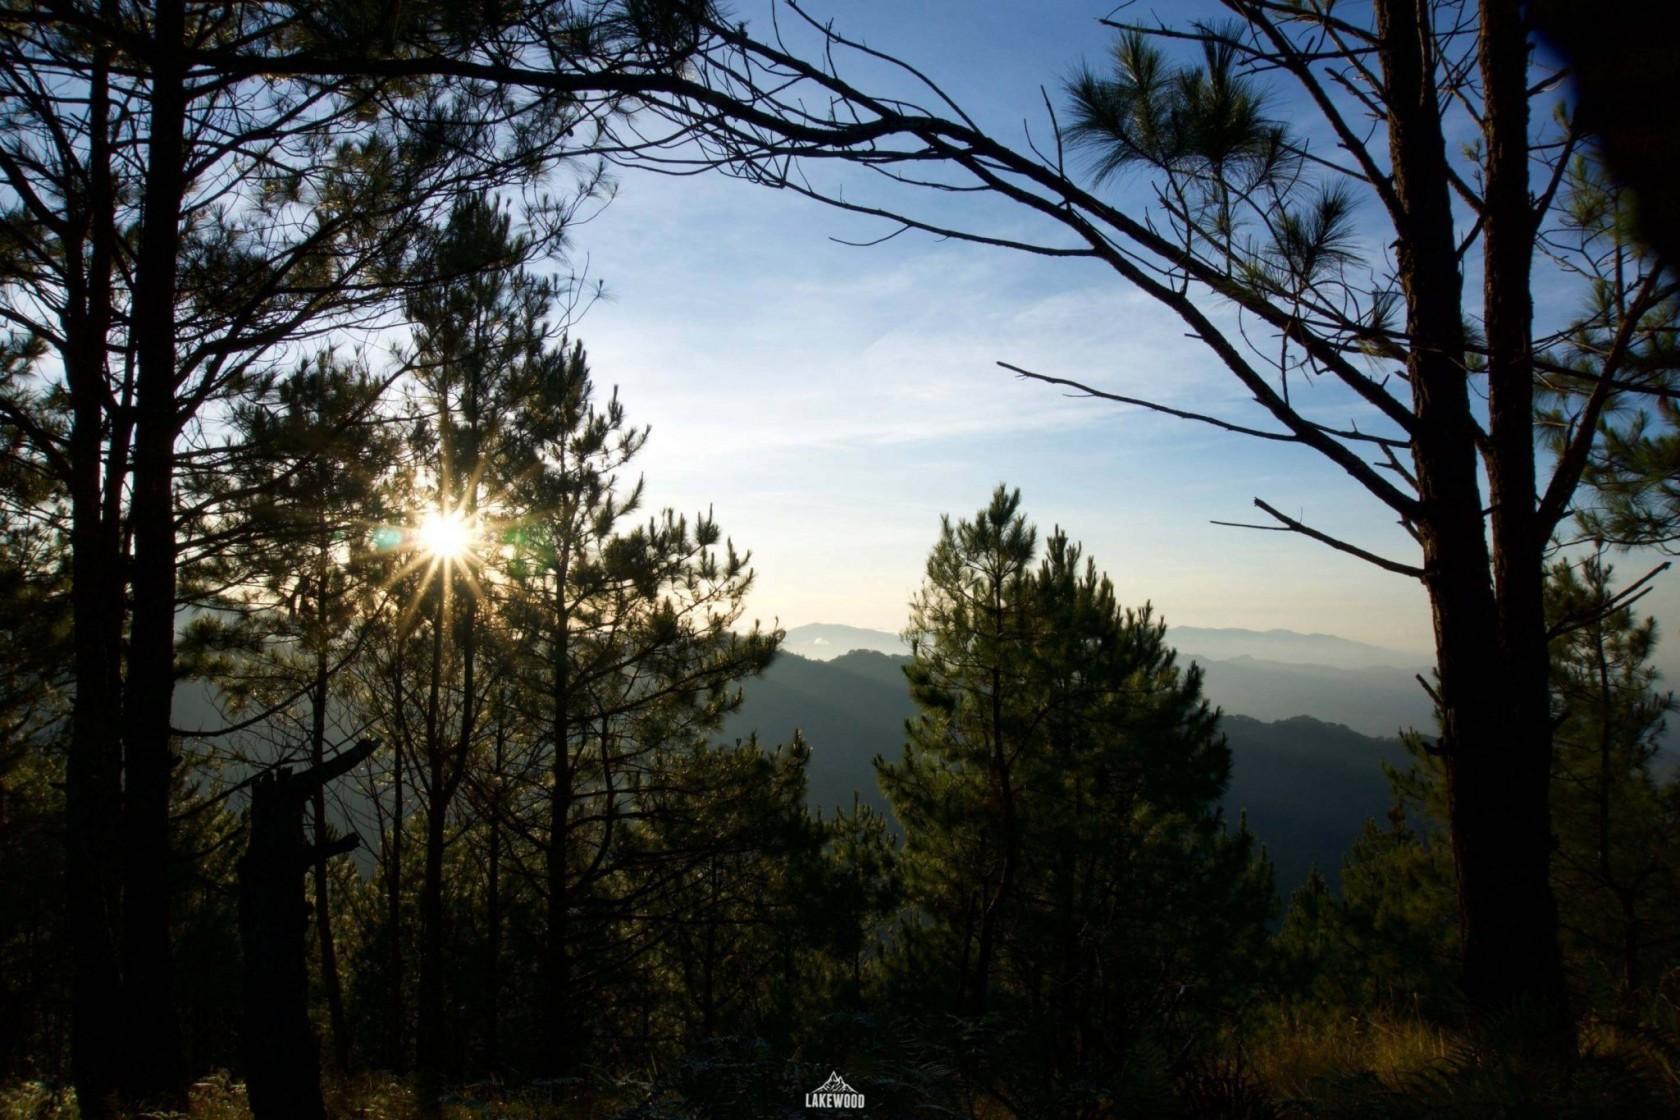 Lakewood Photography Editing & Retouching Service